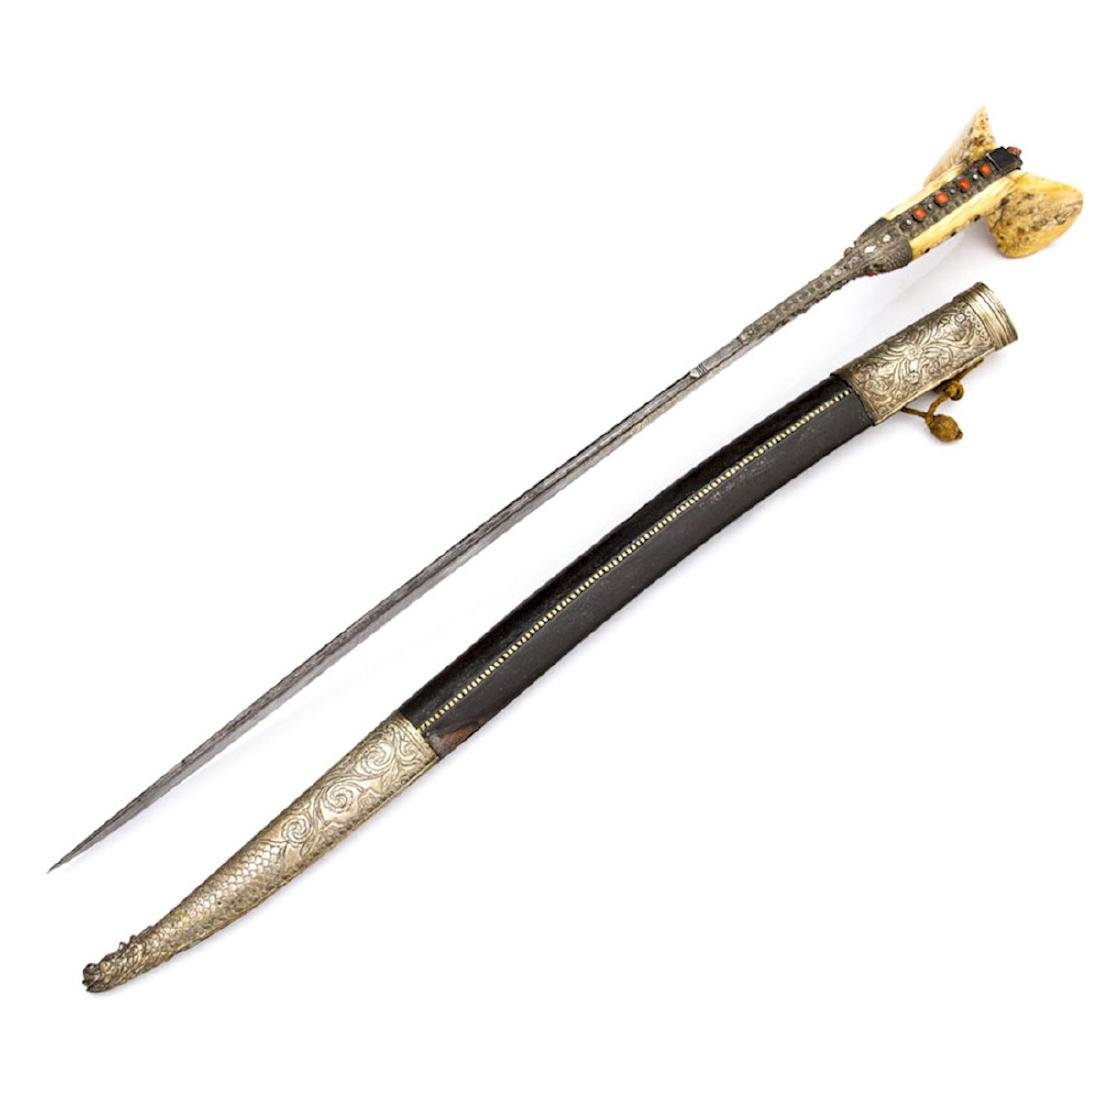 TURKISH YATAGAN SWORD WITH GOLD INLAY - 7